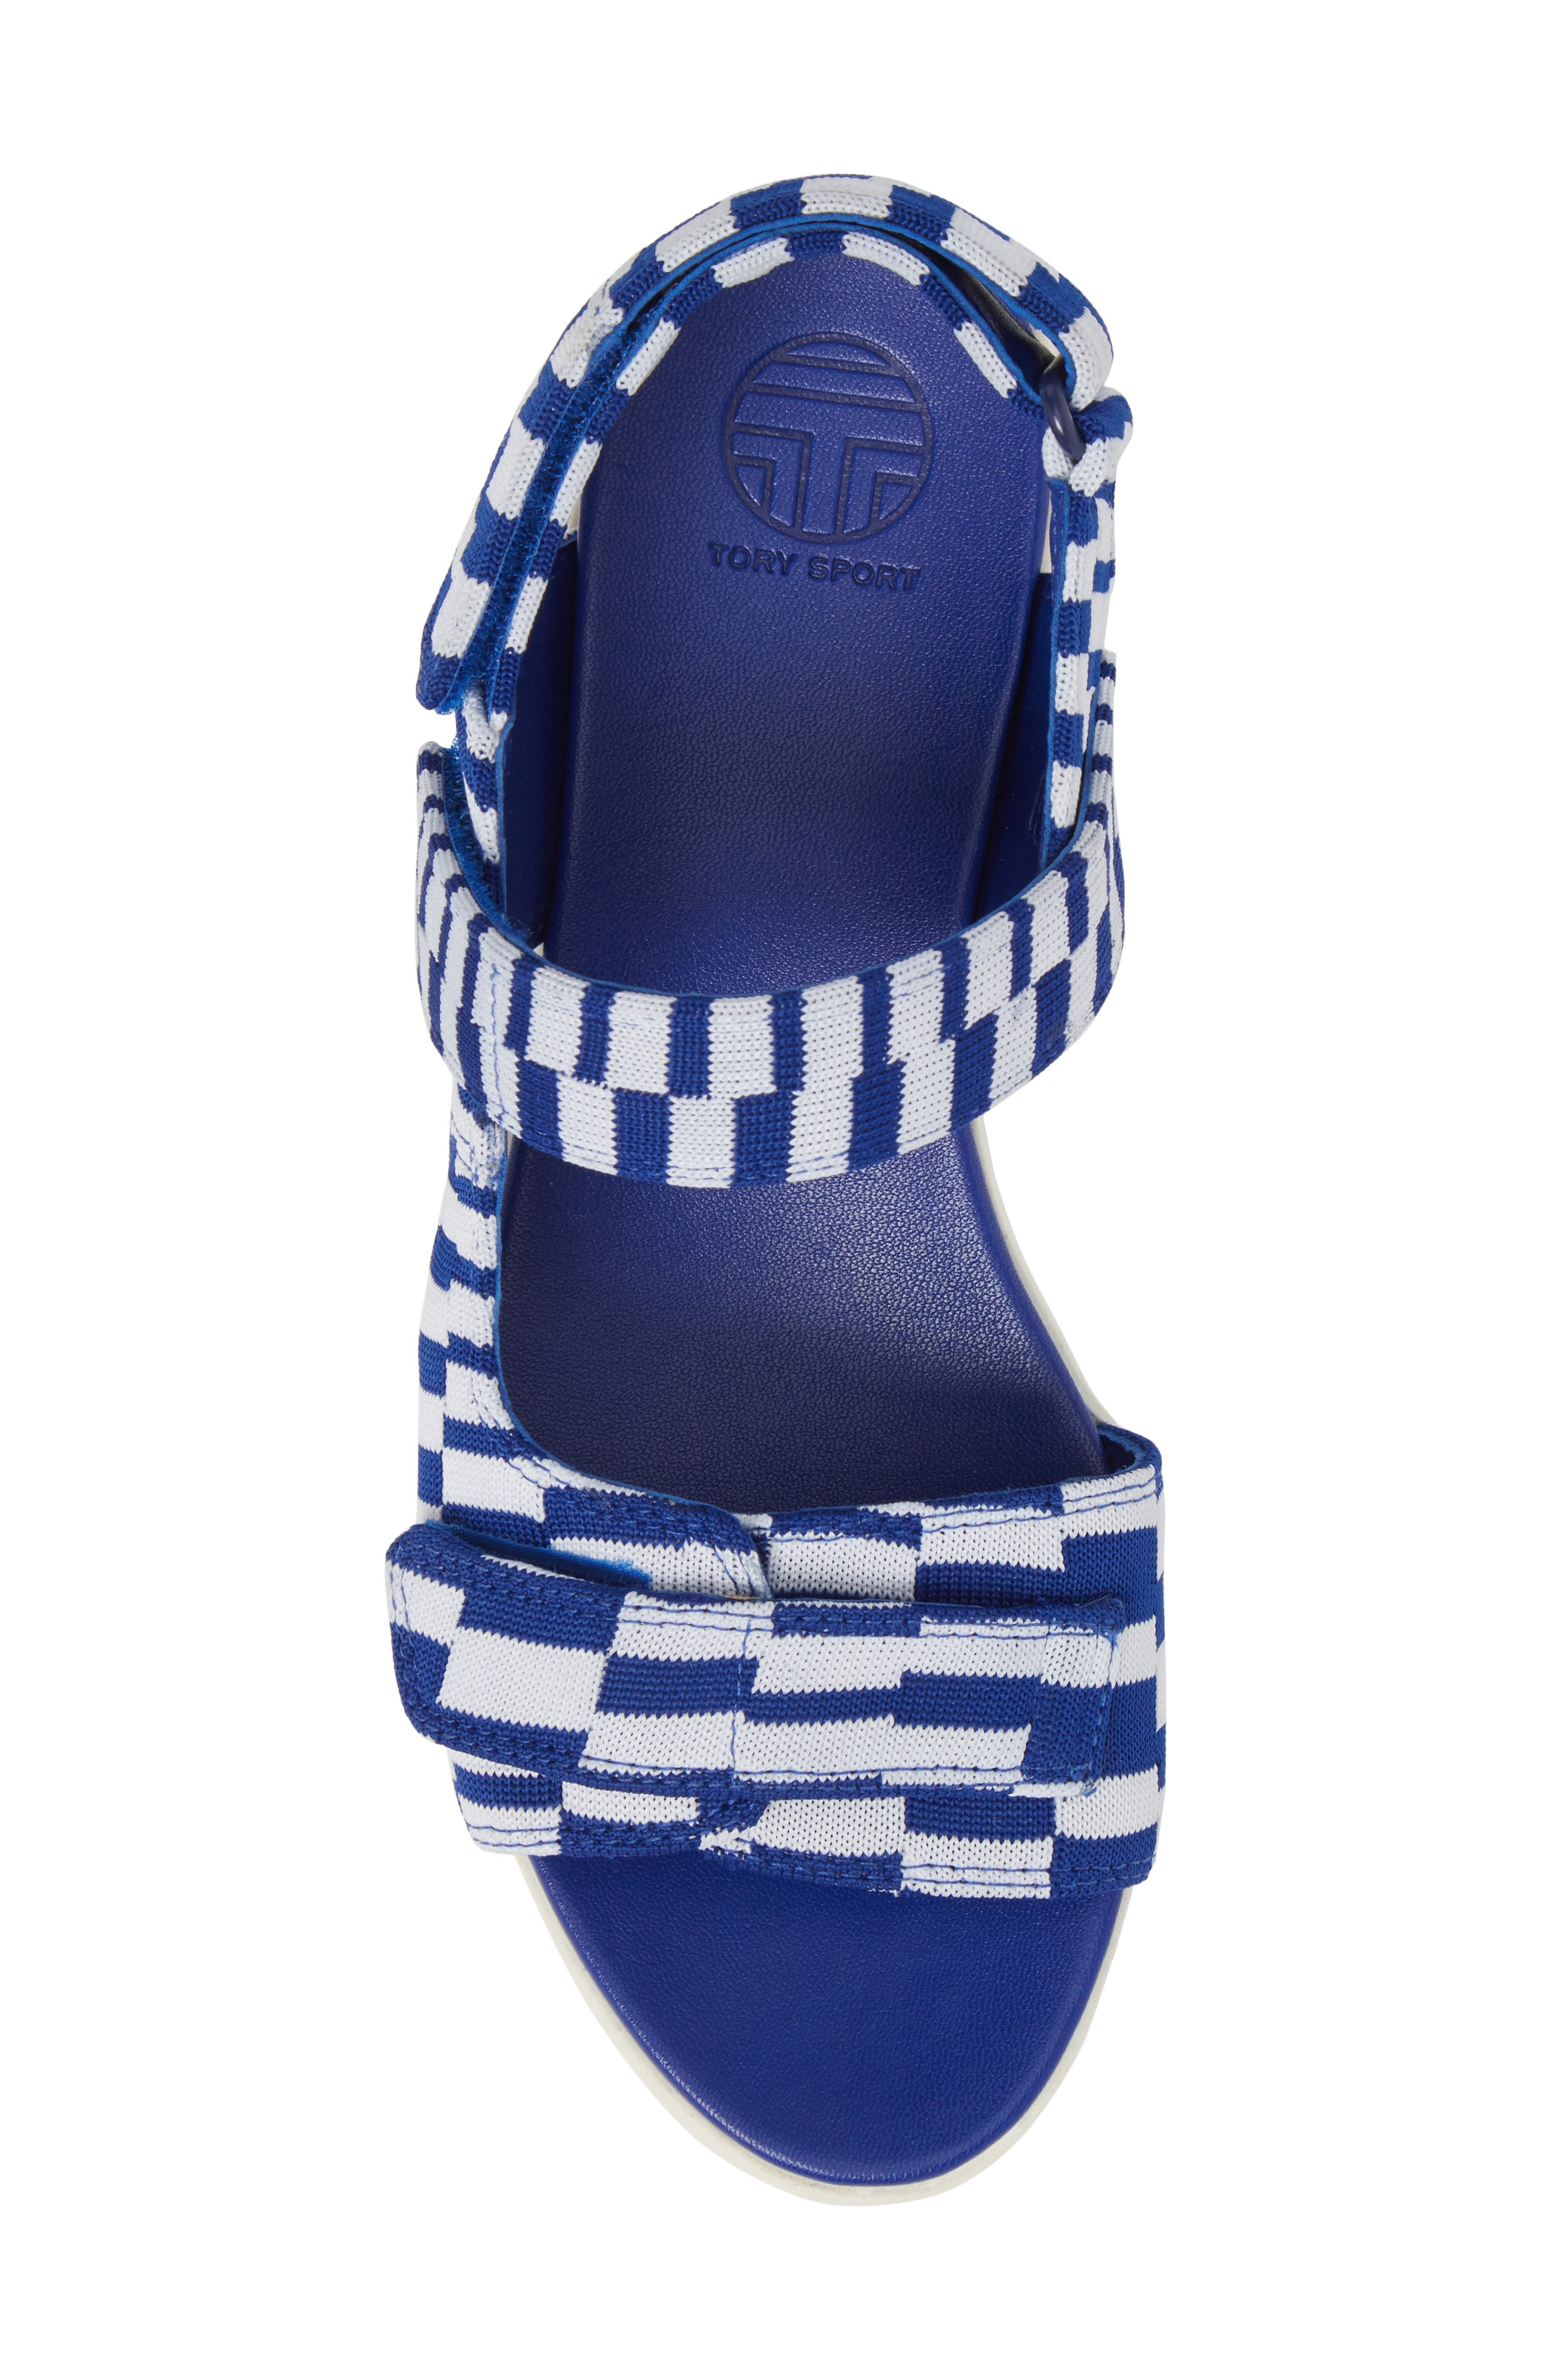 Flatform Sandal,                             Alternate thumbnail 5, color,                             Check Slalom Blue